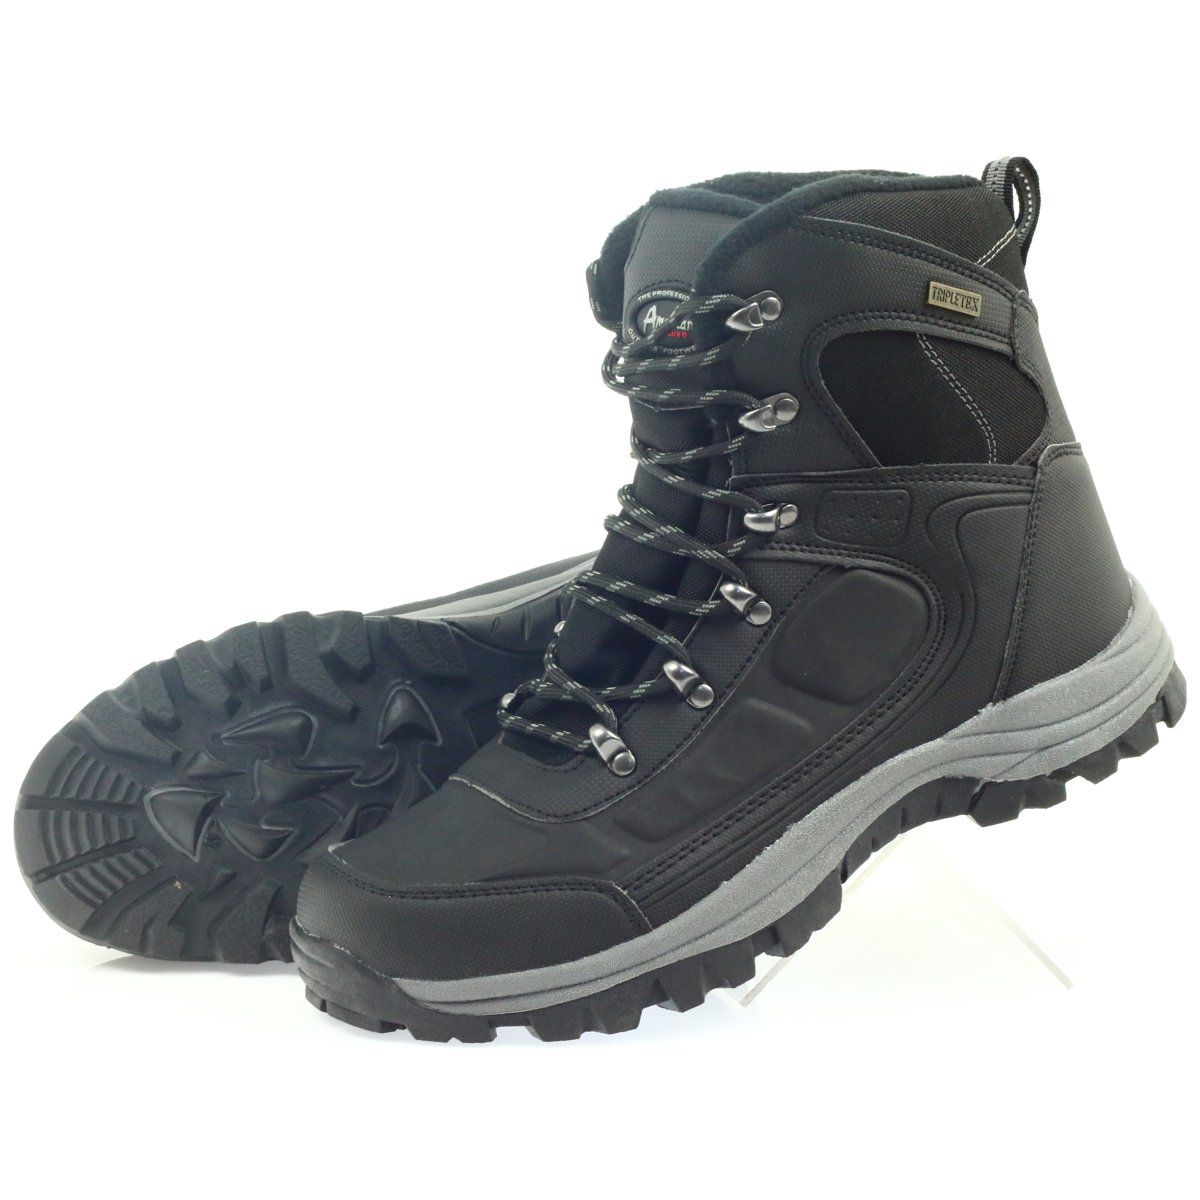 American Club American Trekkingi Buty Zimowe Z Membrana Czarne Shoes Hiking Boots Boots